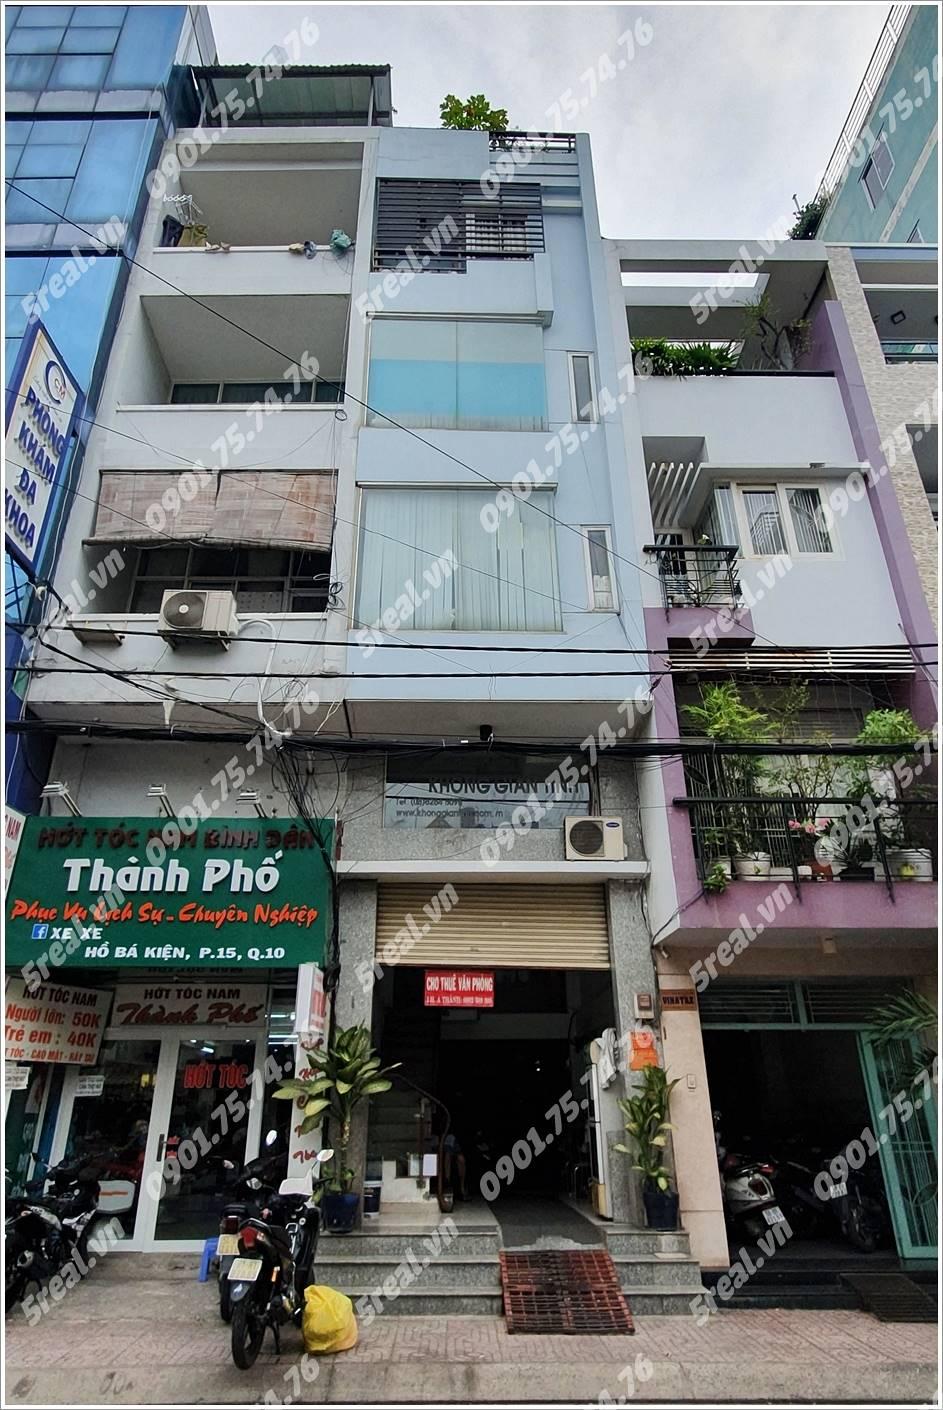 kgt-building-ho-ba-kien-quan-10-van-phong-cho-thue-tphcm-5real.vn-01